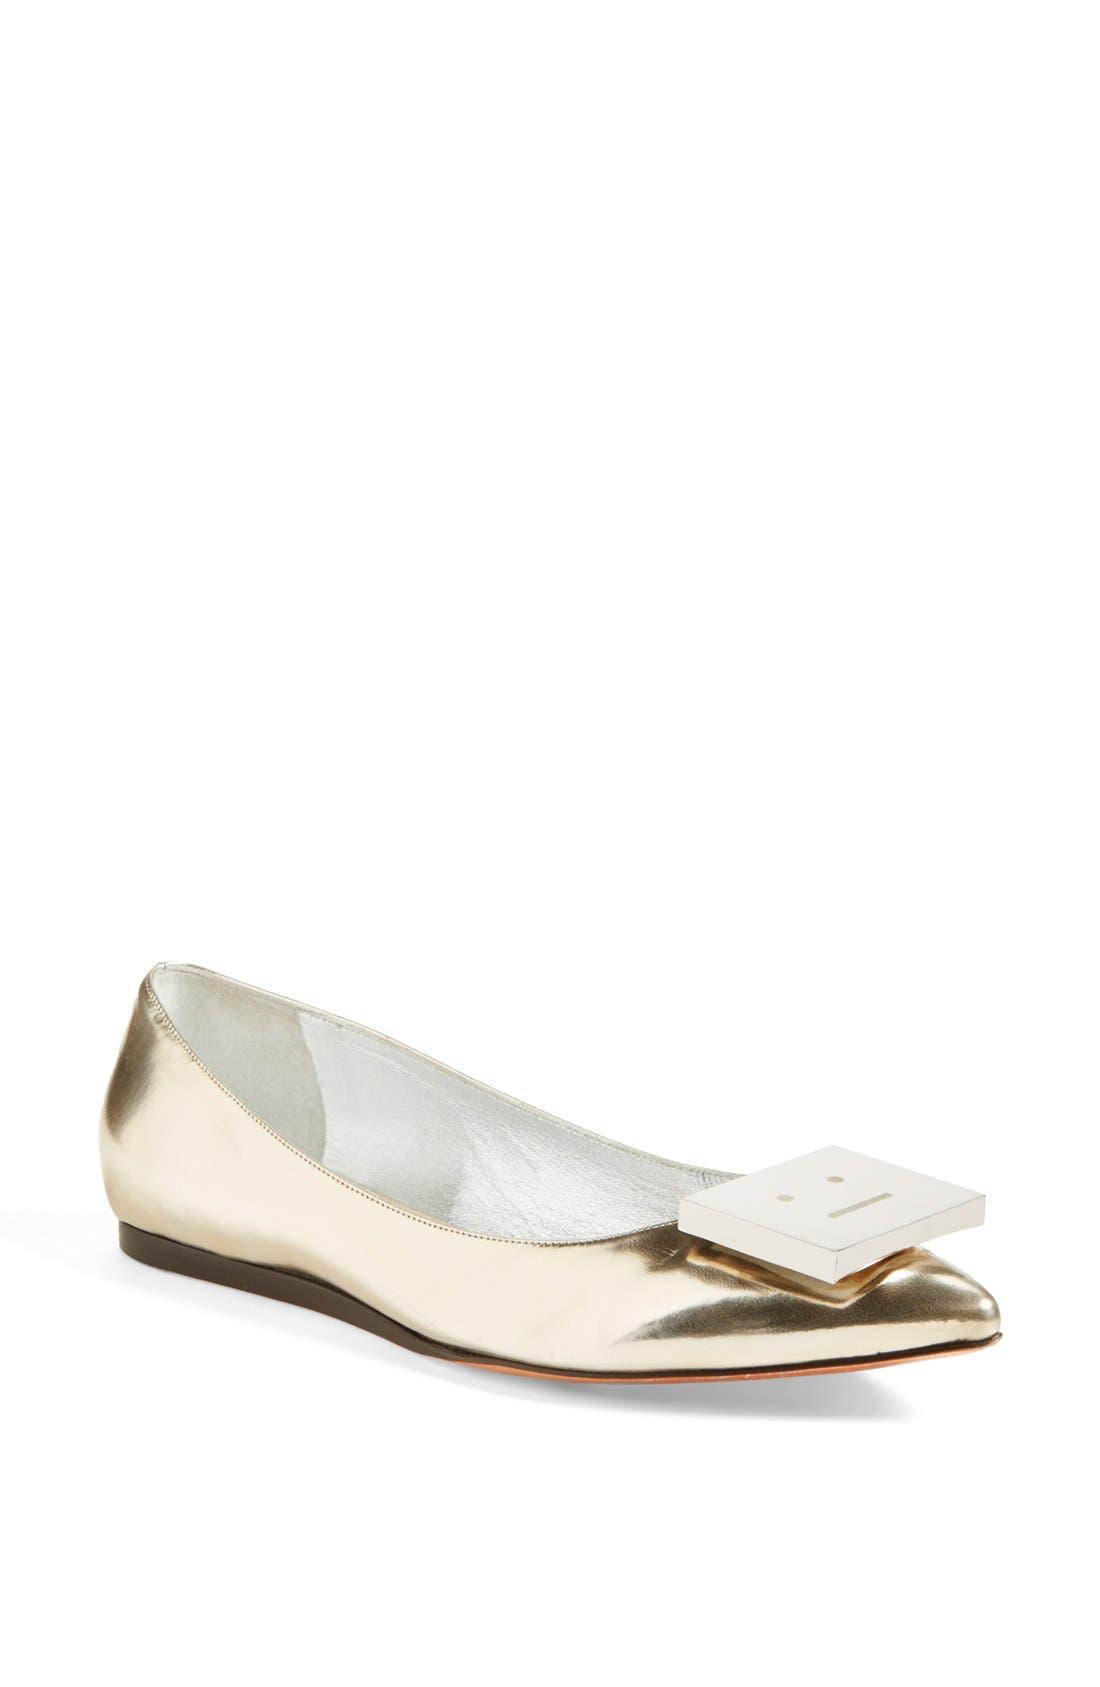 Alternate Image 1 Selected - Acne Studios 'Aida' Pointy Toe Metallic Leather Flat